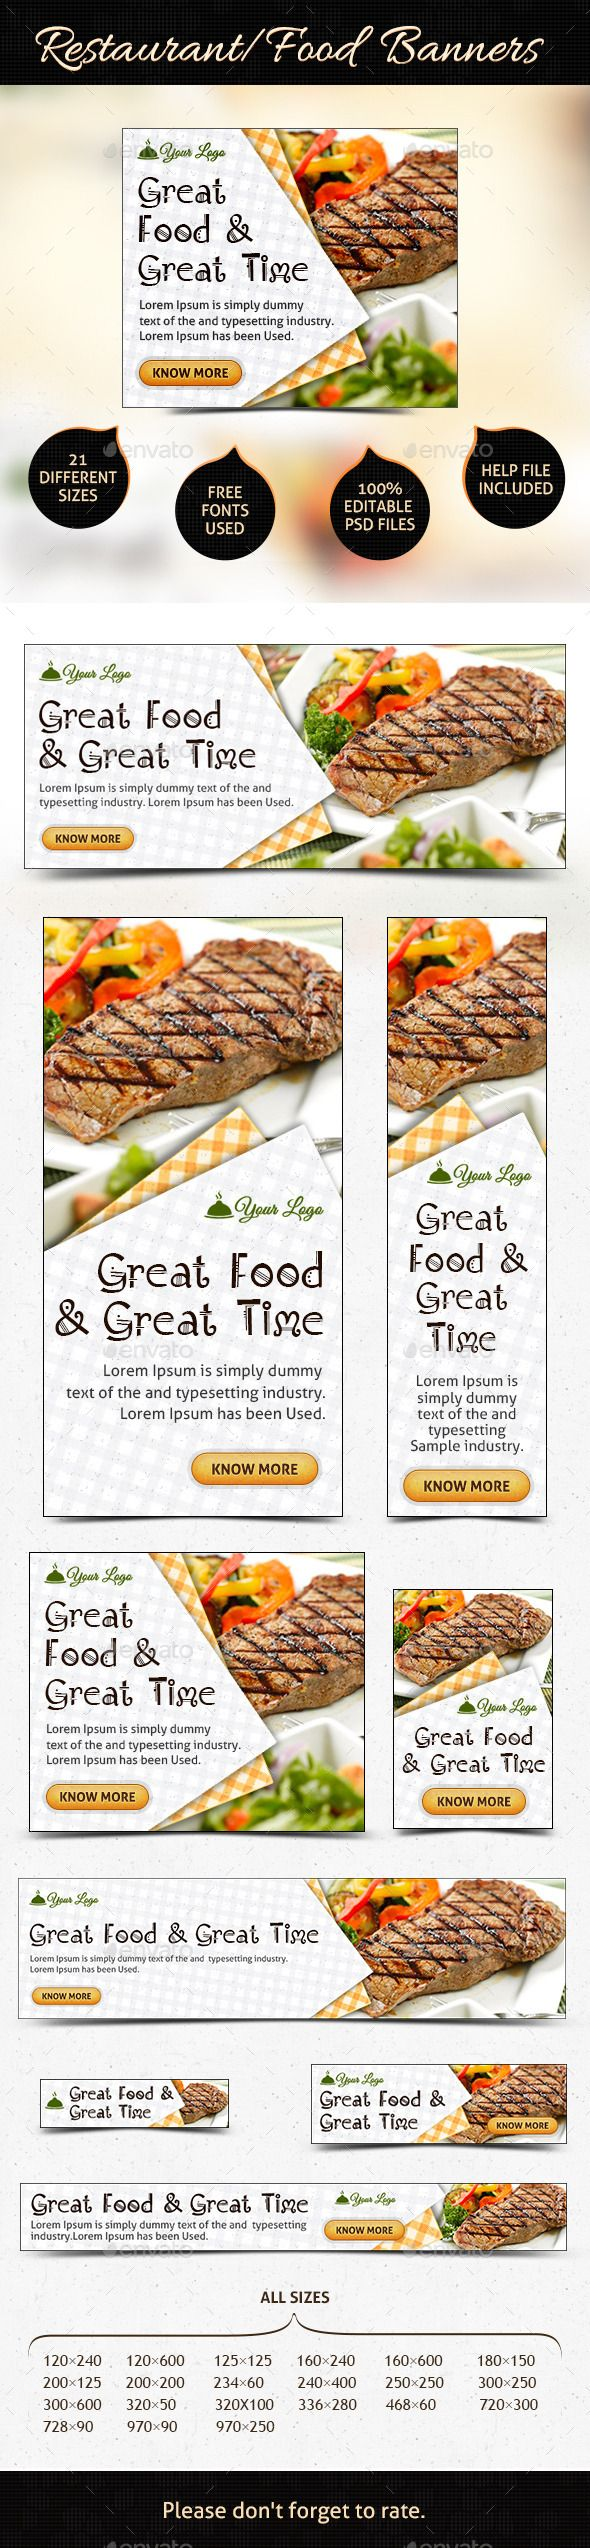 Restaurant Web Banner Ads Template #design #ads Download: http://graphicriver.net/item/restaurant-web-banner-ads/12369943?ref=ksioks